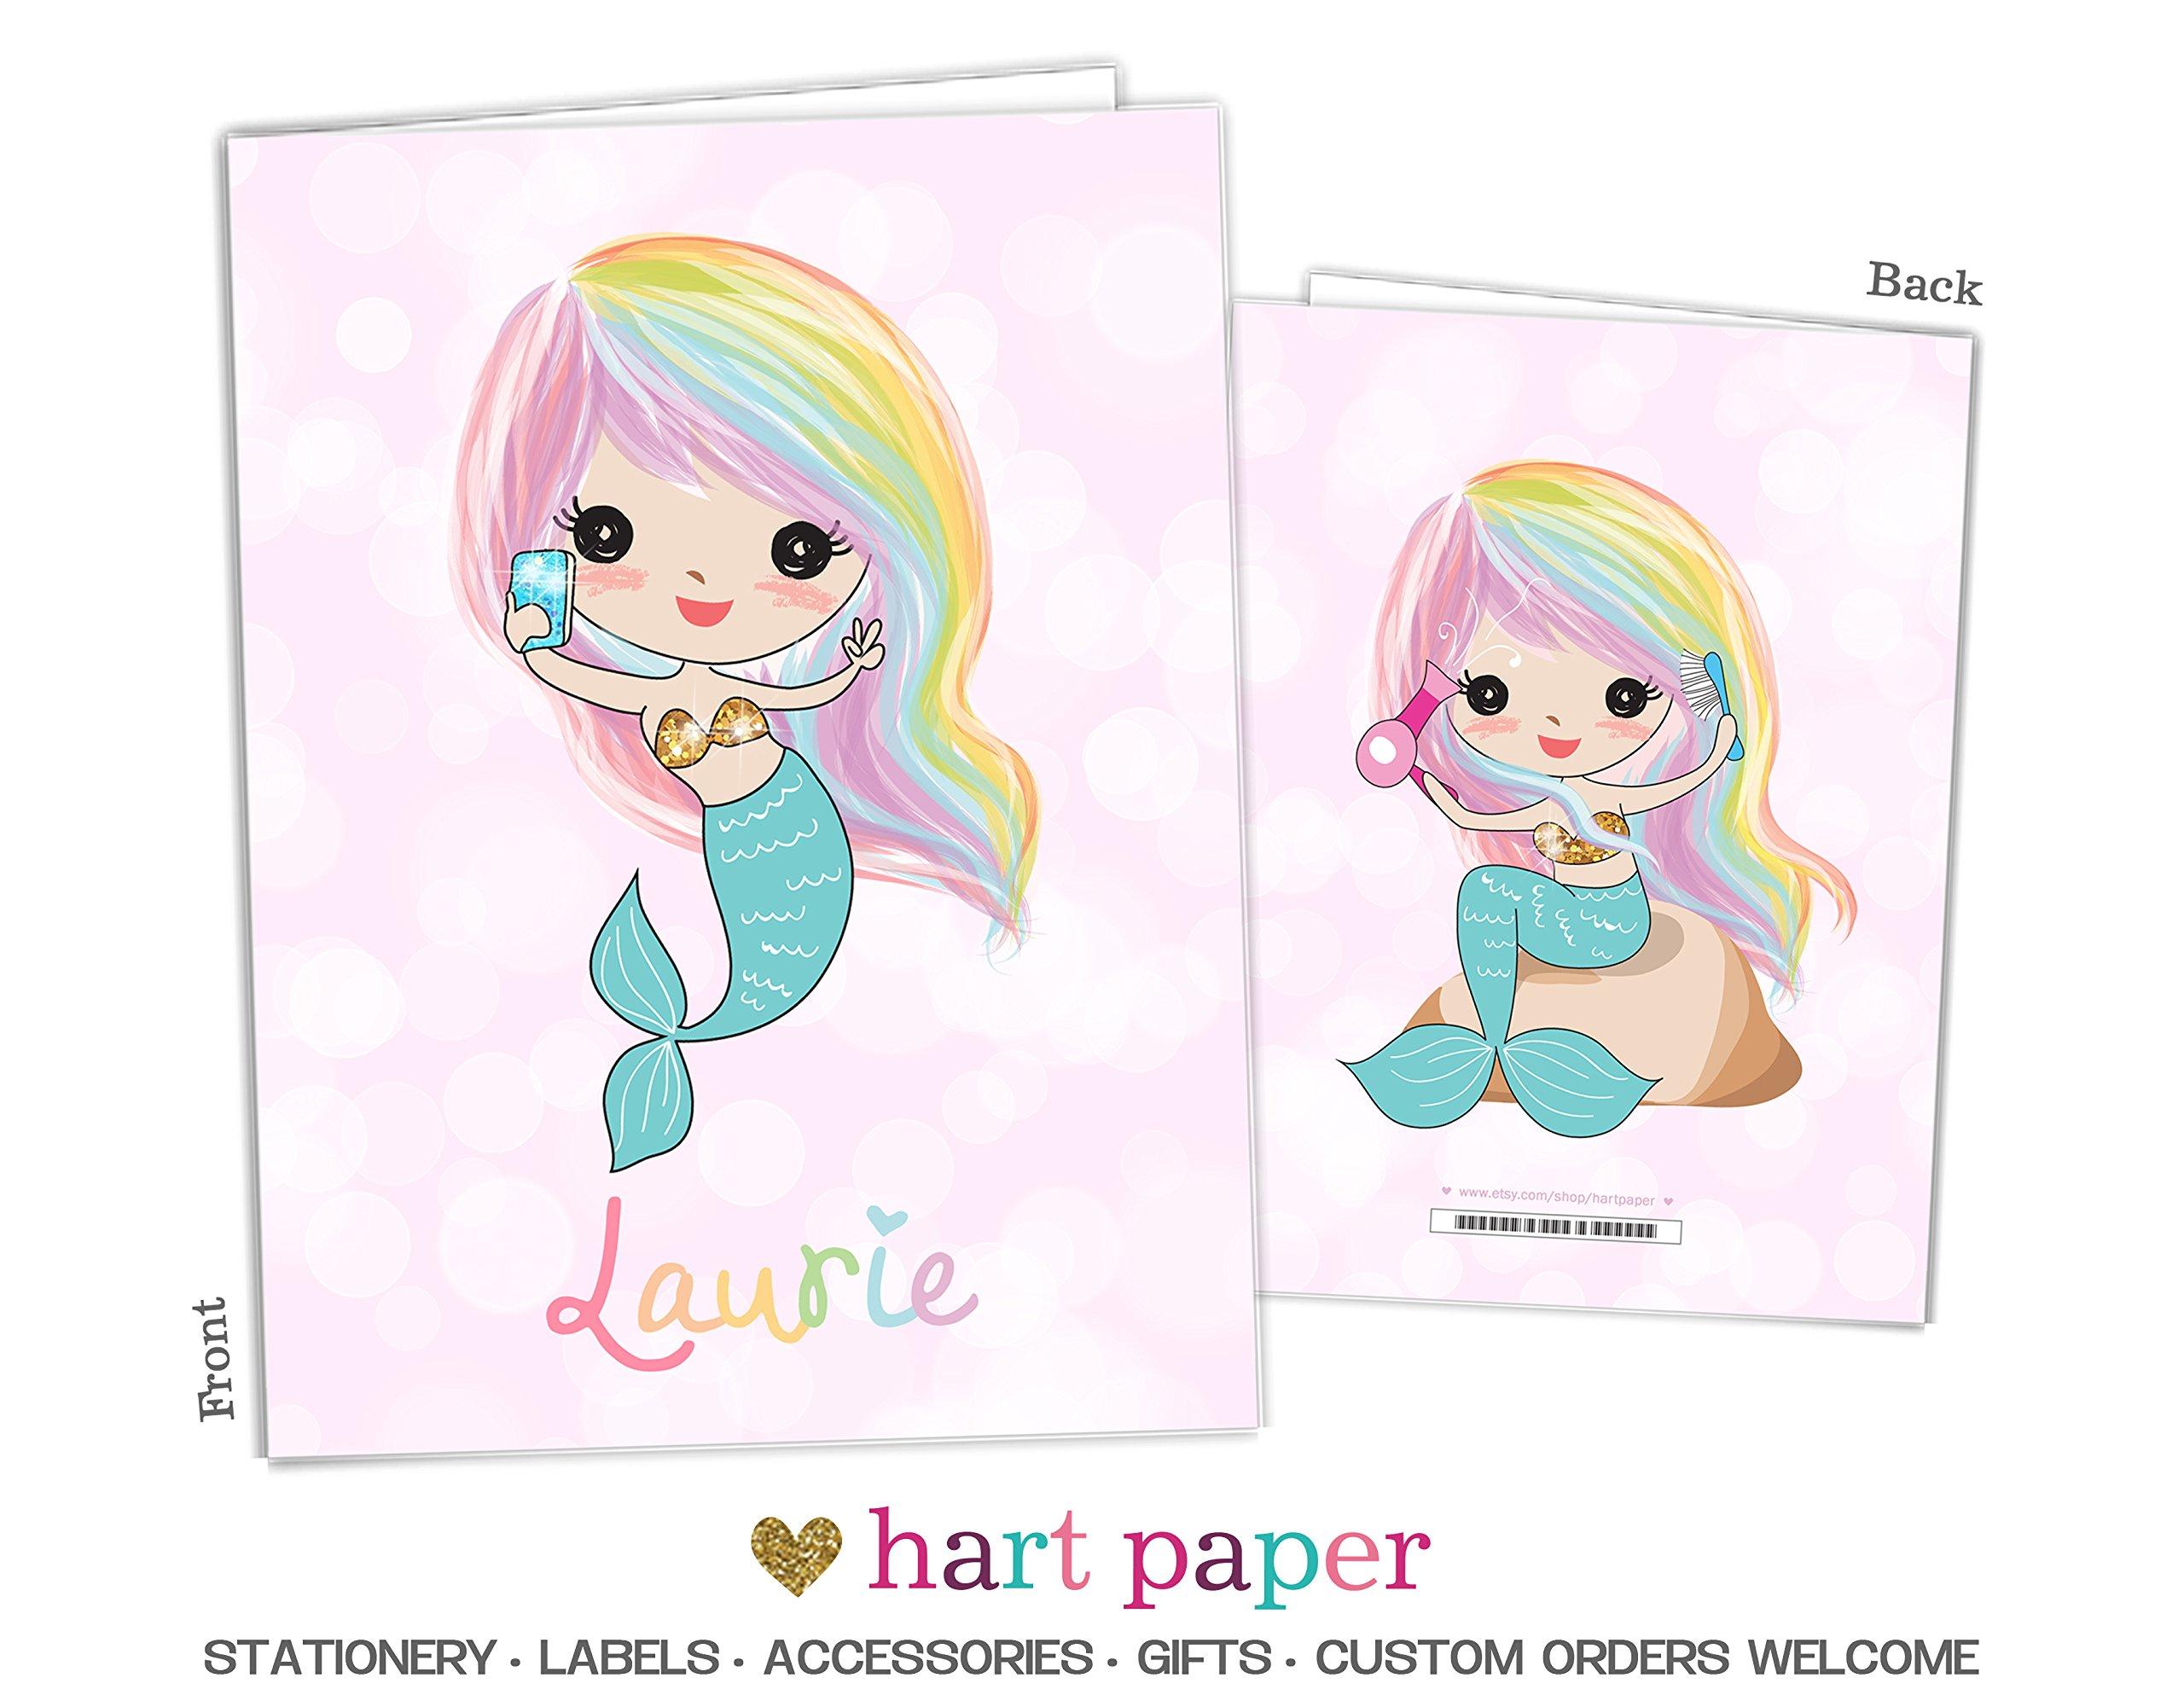 Rainbow Mermaid 2 Pocket Folder Gift Name Back to School Supplies Teacher Office Birthday Girl Boy Adult Kids Custom Personalized Custom